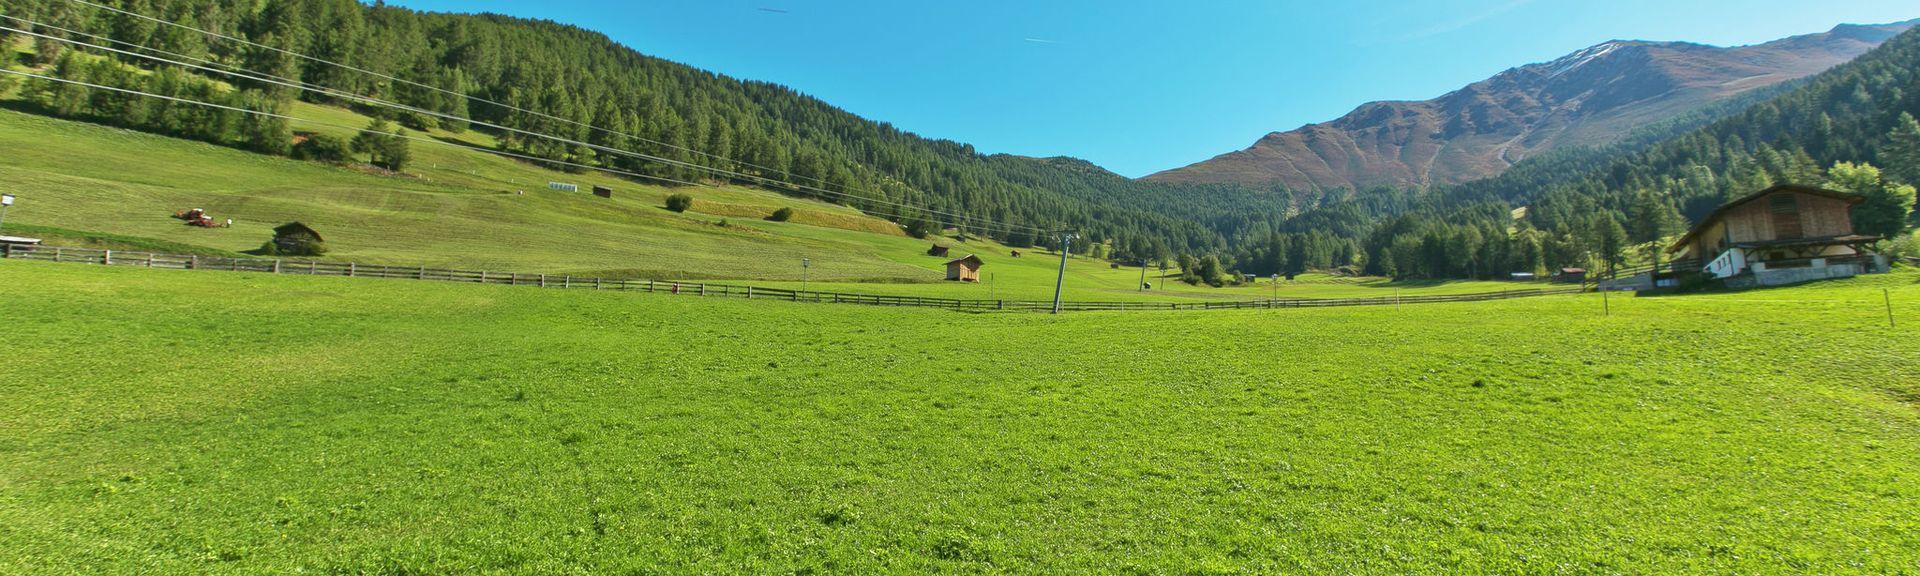 Ried im Oberinntal, Tirolo, Austria